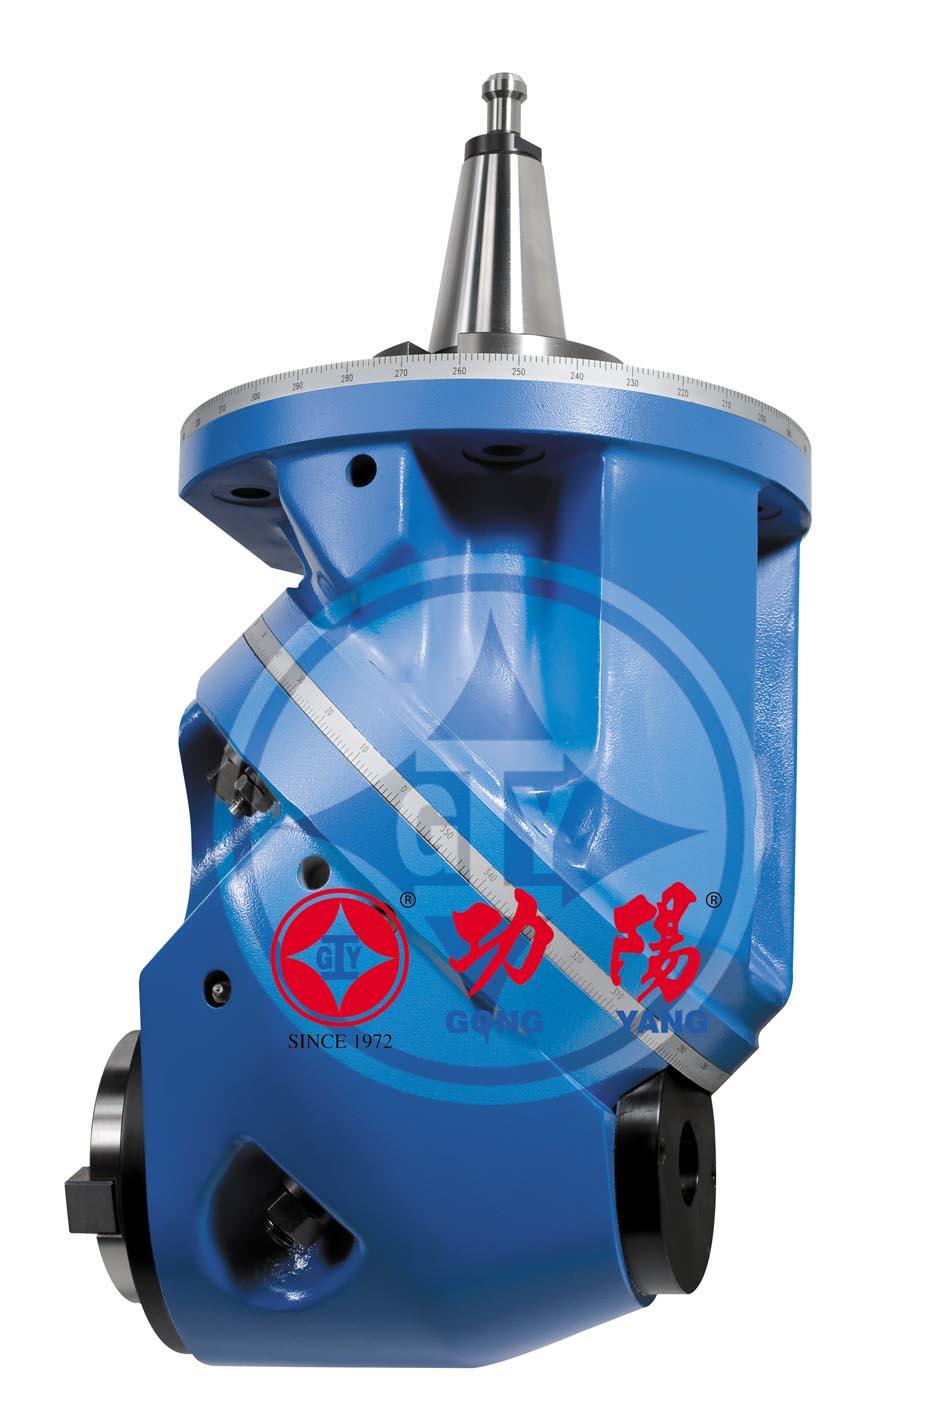 GY-C50 Multi-angular milling Head